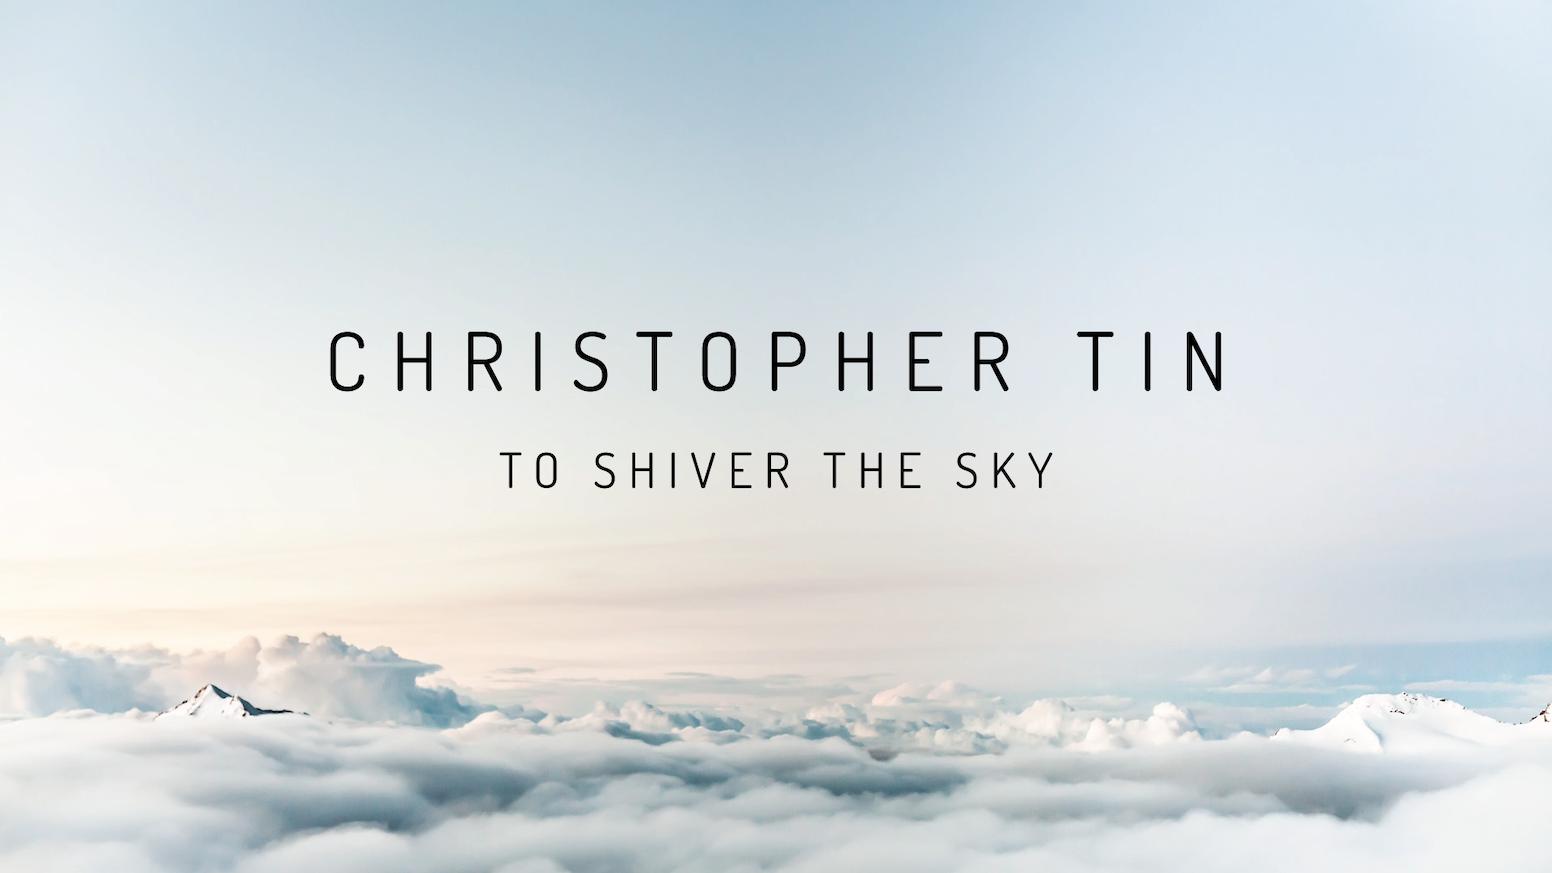 New Album by Christopher Tin (Baba Yetu, Civilization)